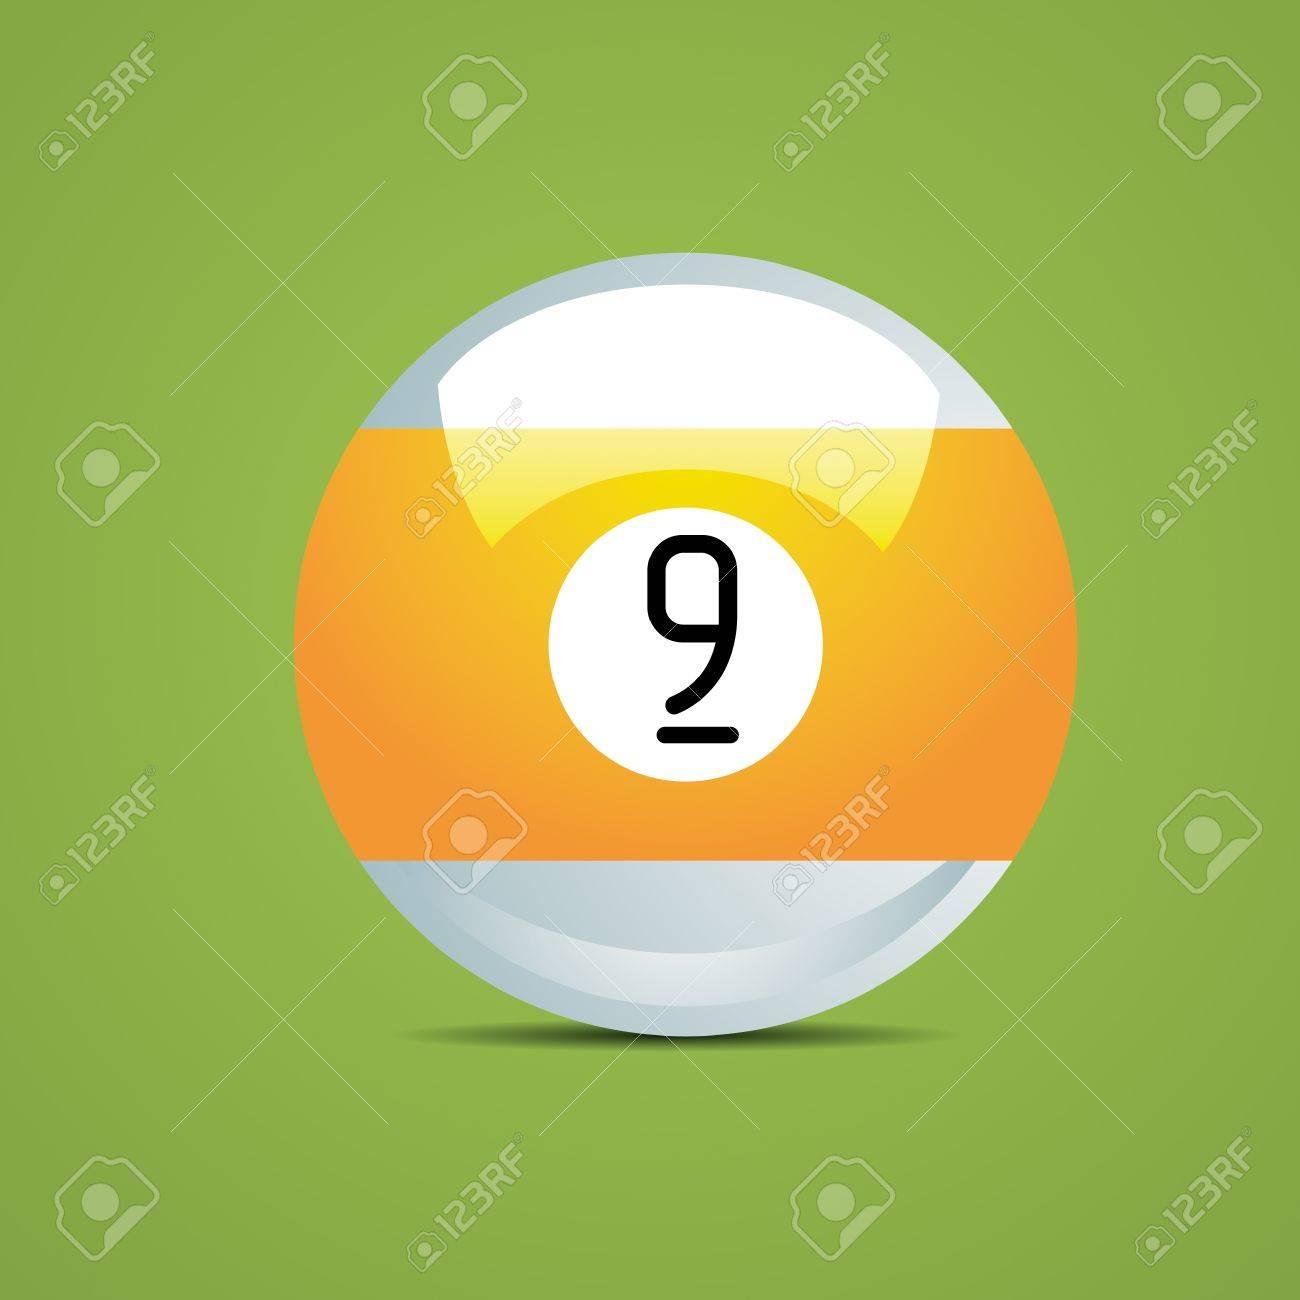 Billard Neuf numéro moitié boule de billard neuf jeu 9 sport loisir queue de